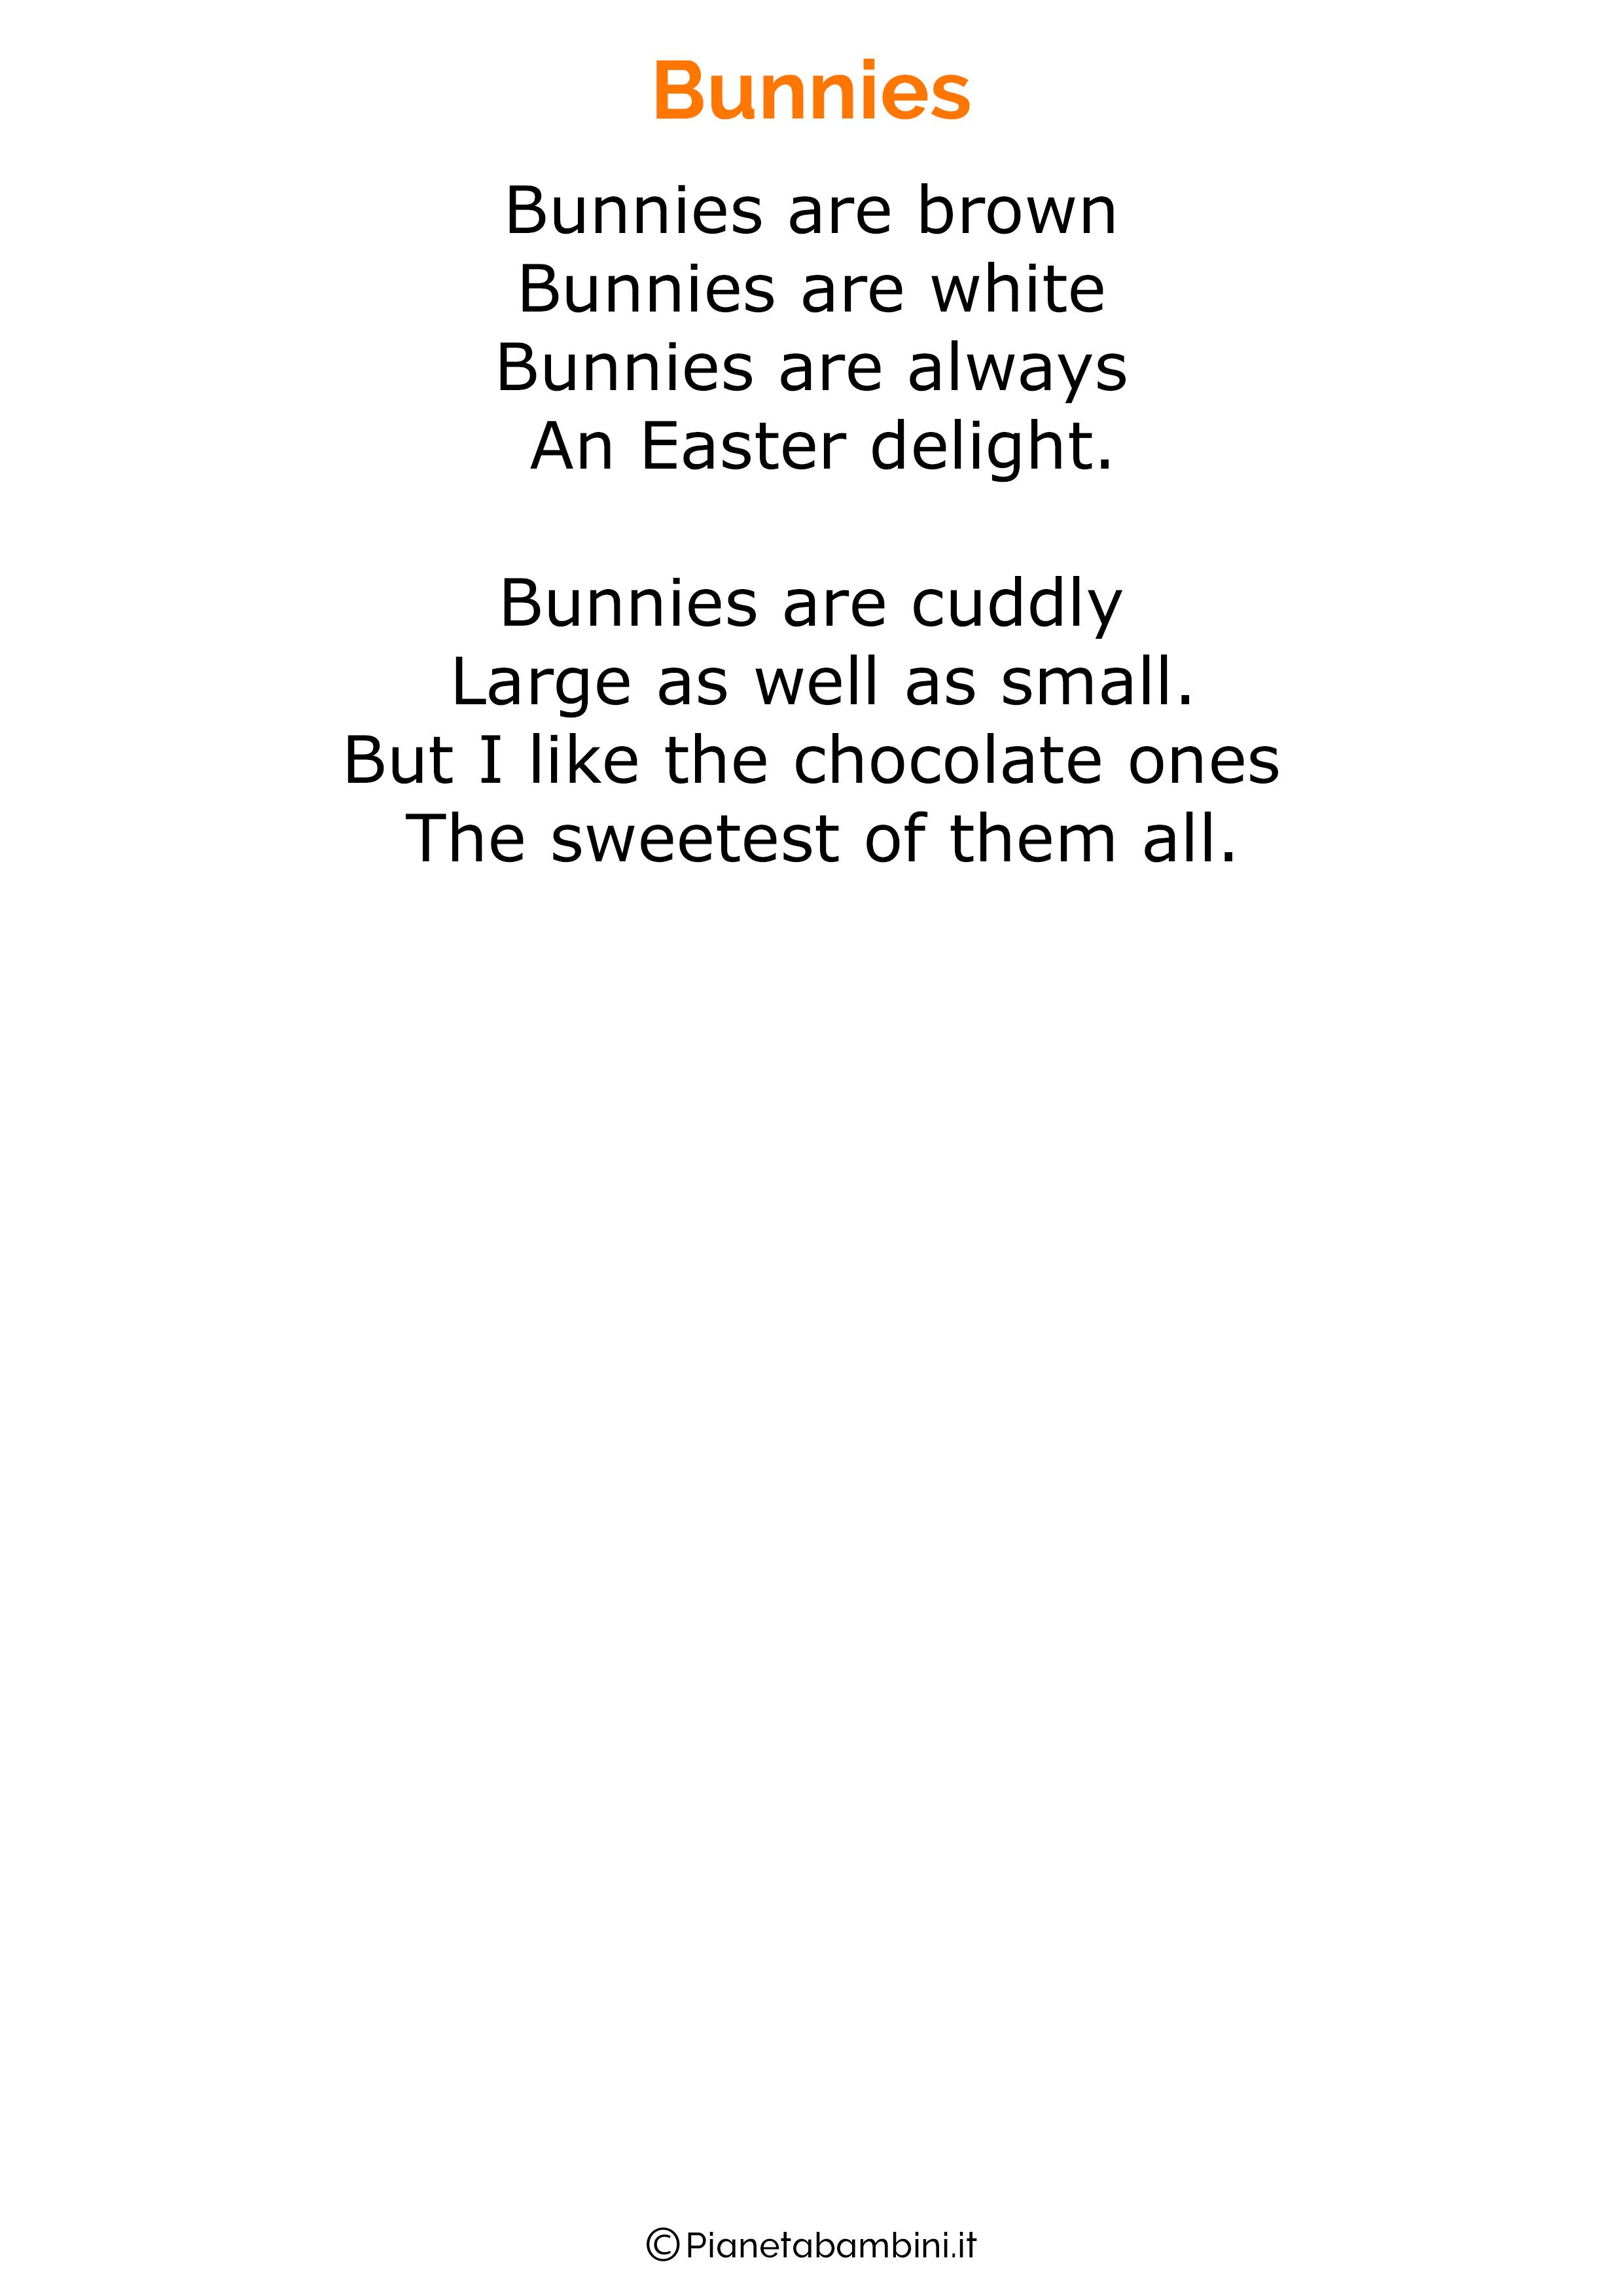 Poesie di Pasqua in inglese per bambini 05